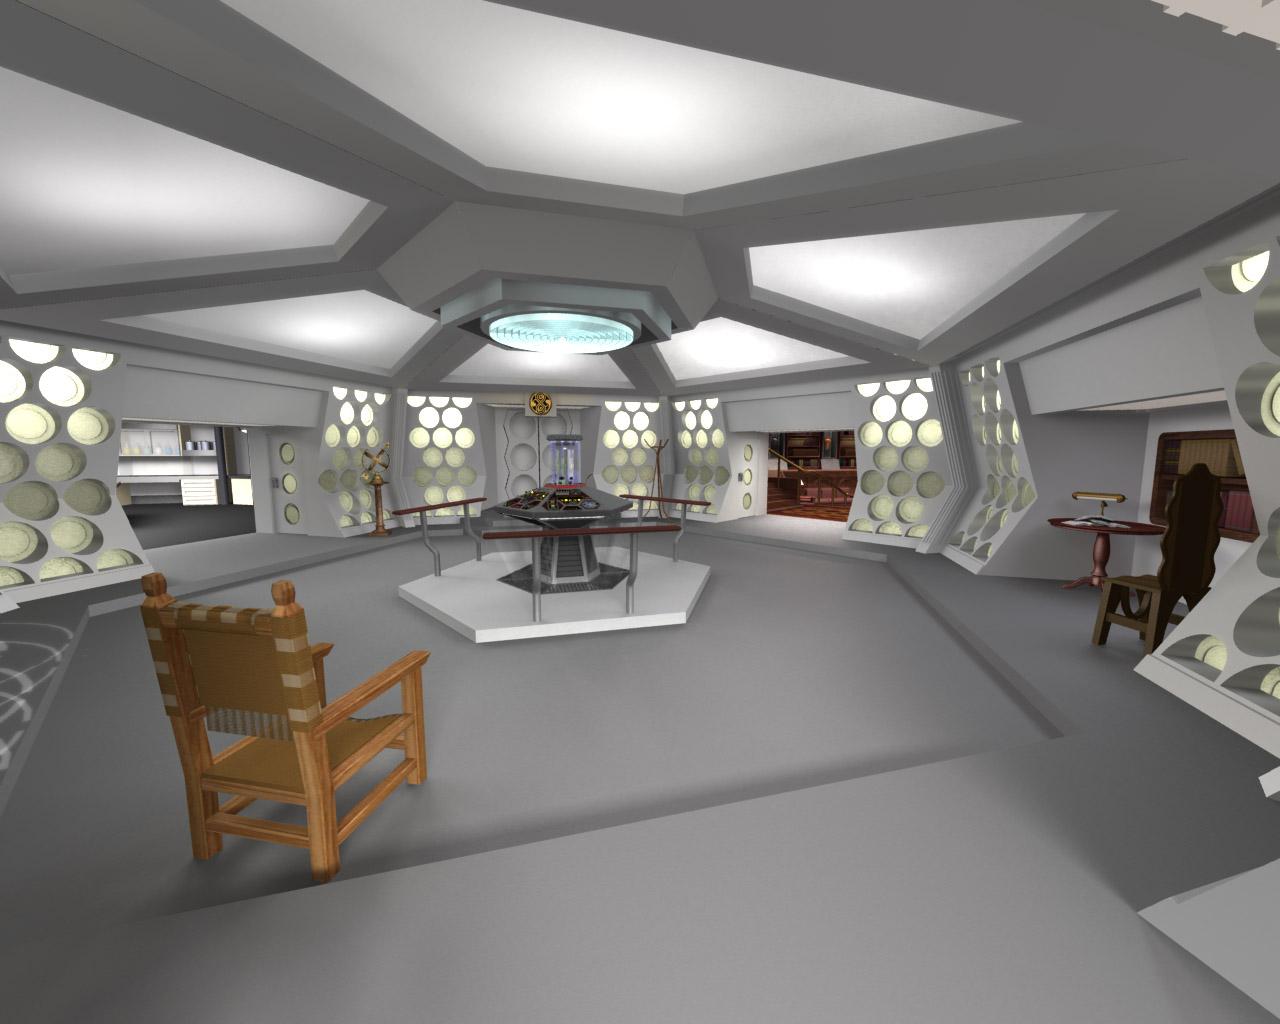 tardiscontrolroom.jpg